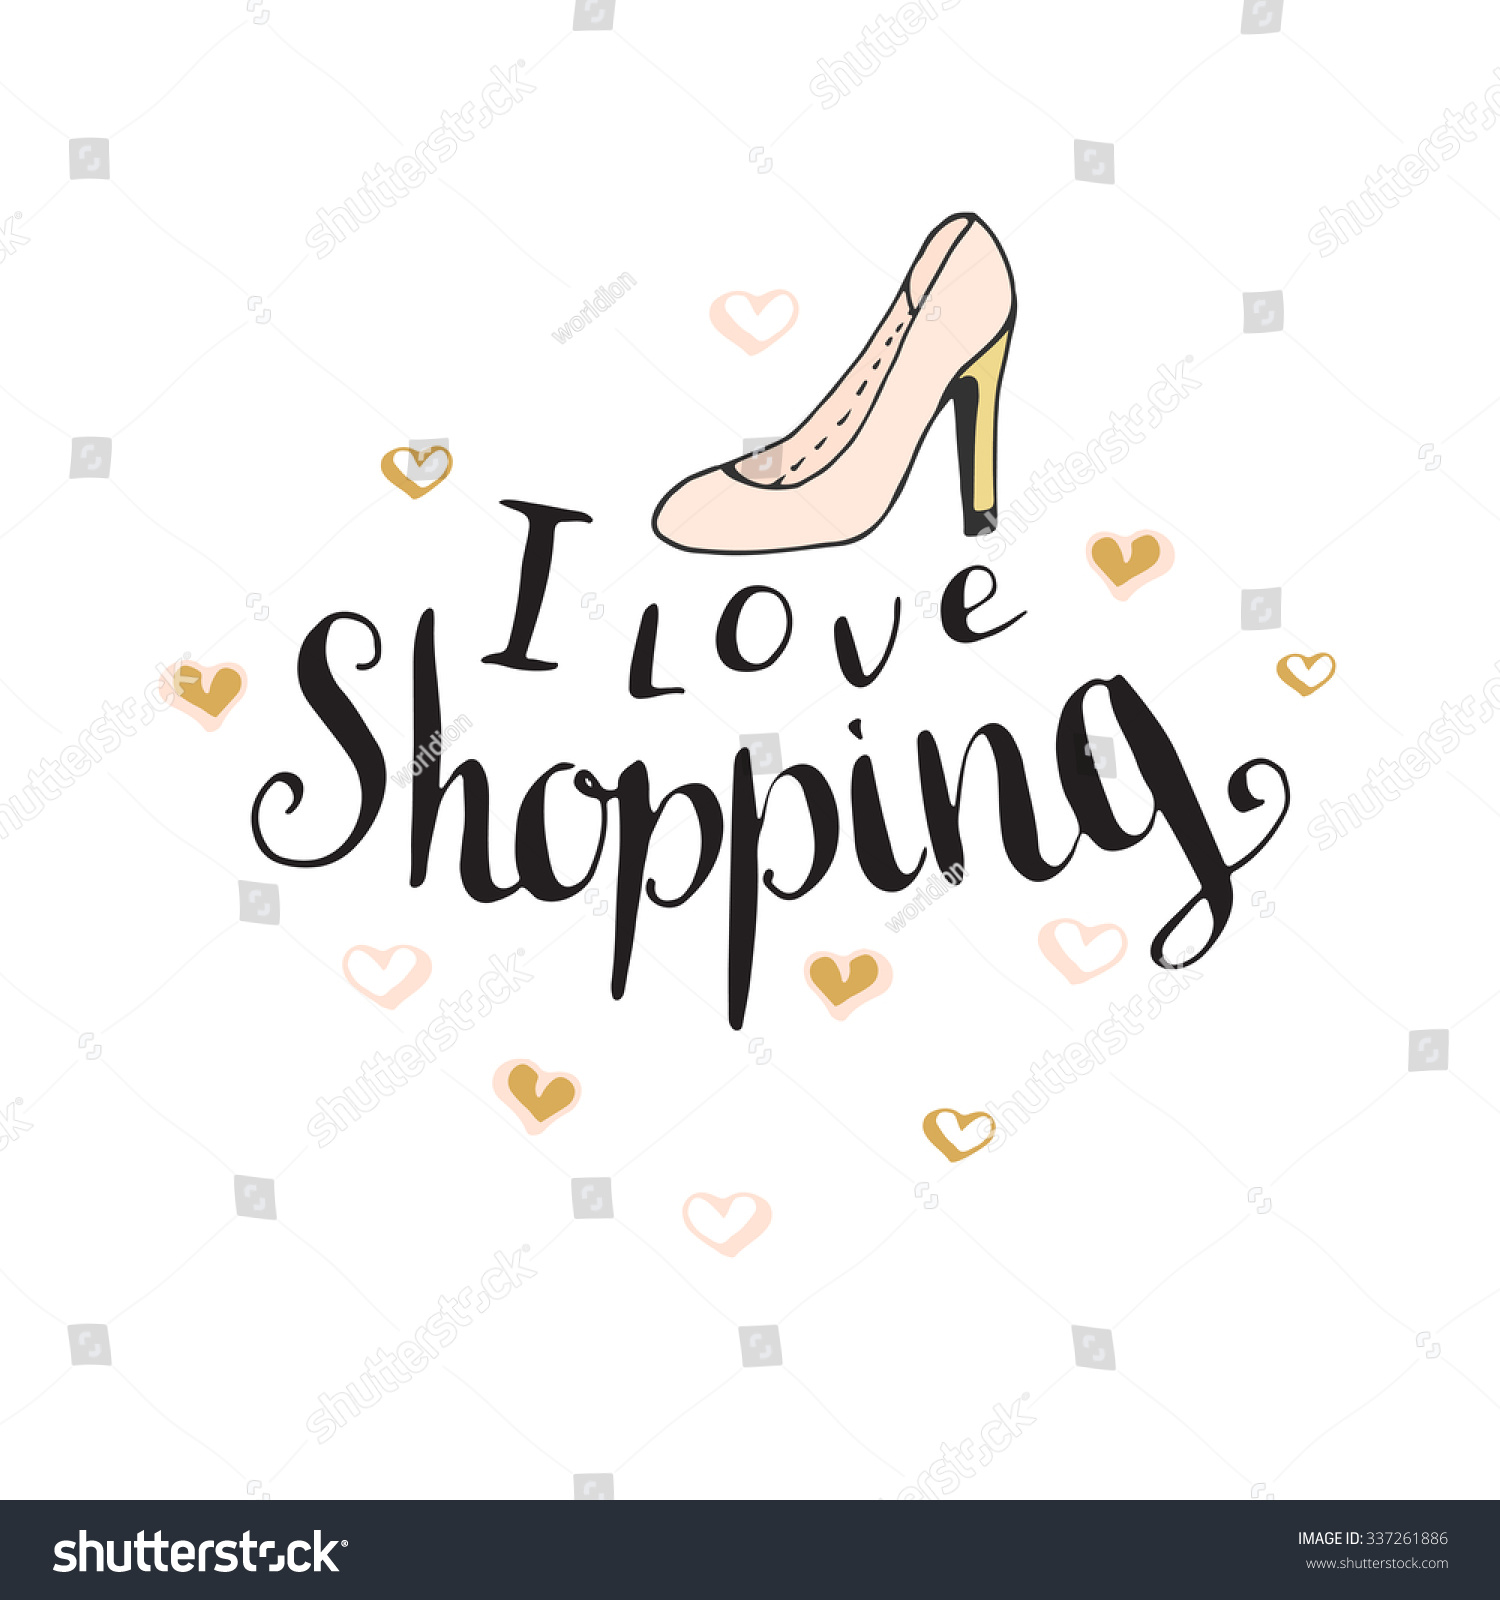 Love Shopping Fashion Quote Blog Design Stock Vector